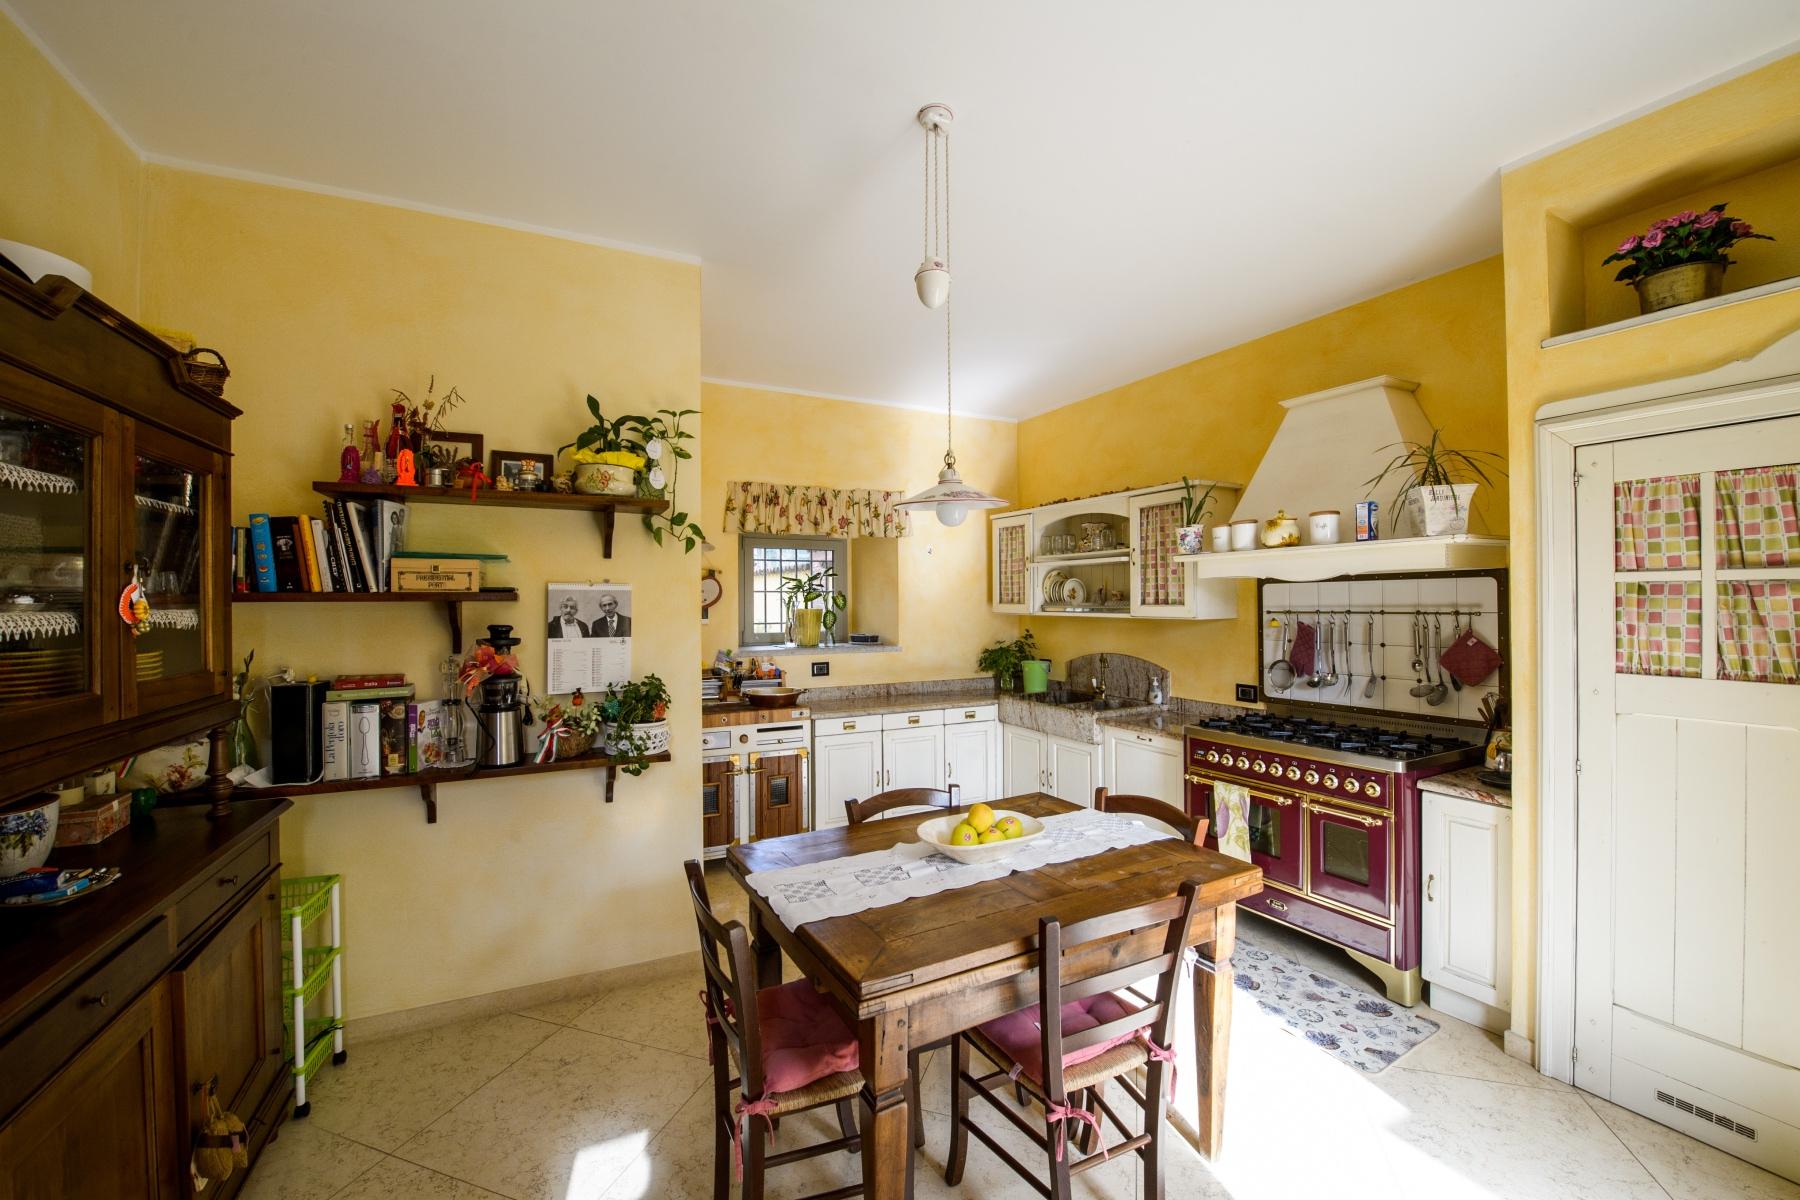 Casa indipendente in Vendita a Agrate Conturbia: 5 locali, 400 mq - Foto 6